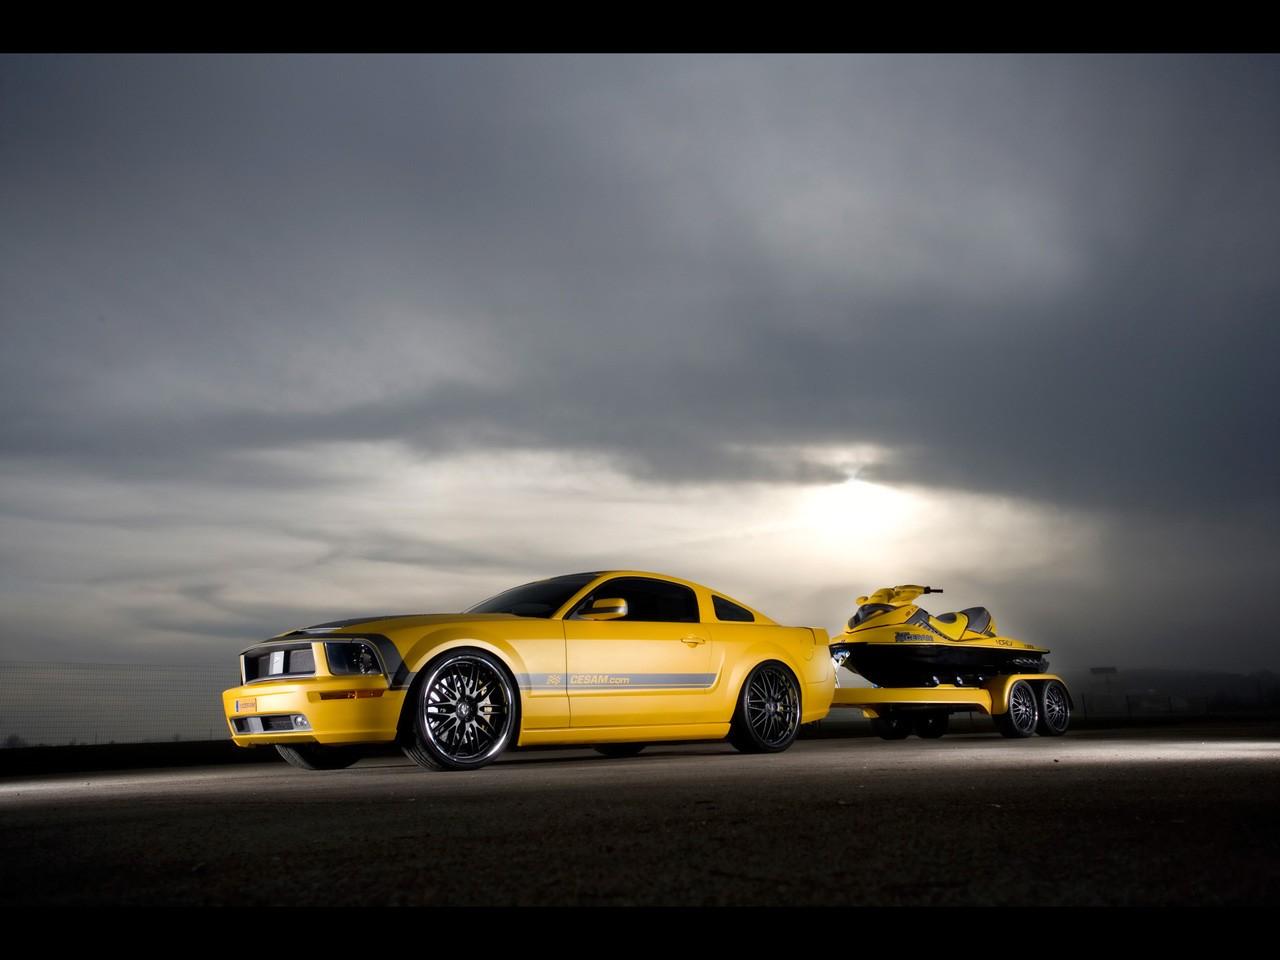 Cesam Ford Mustang 2007 - Parotech